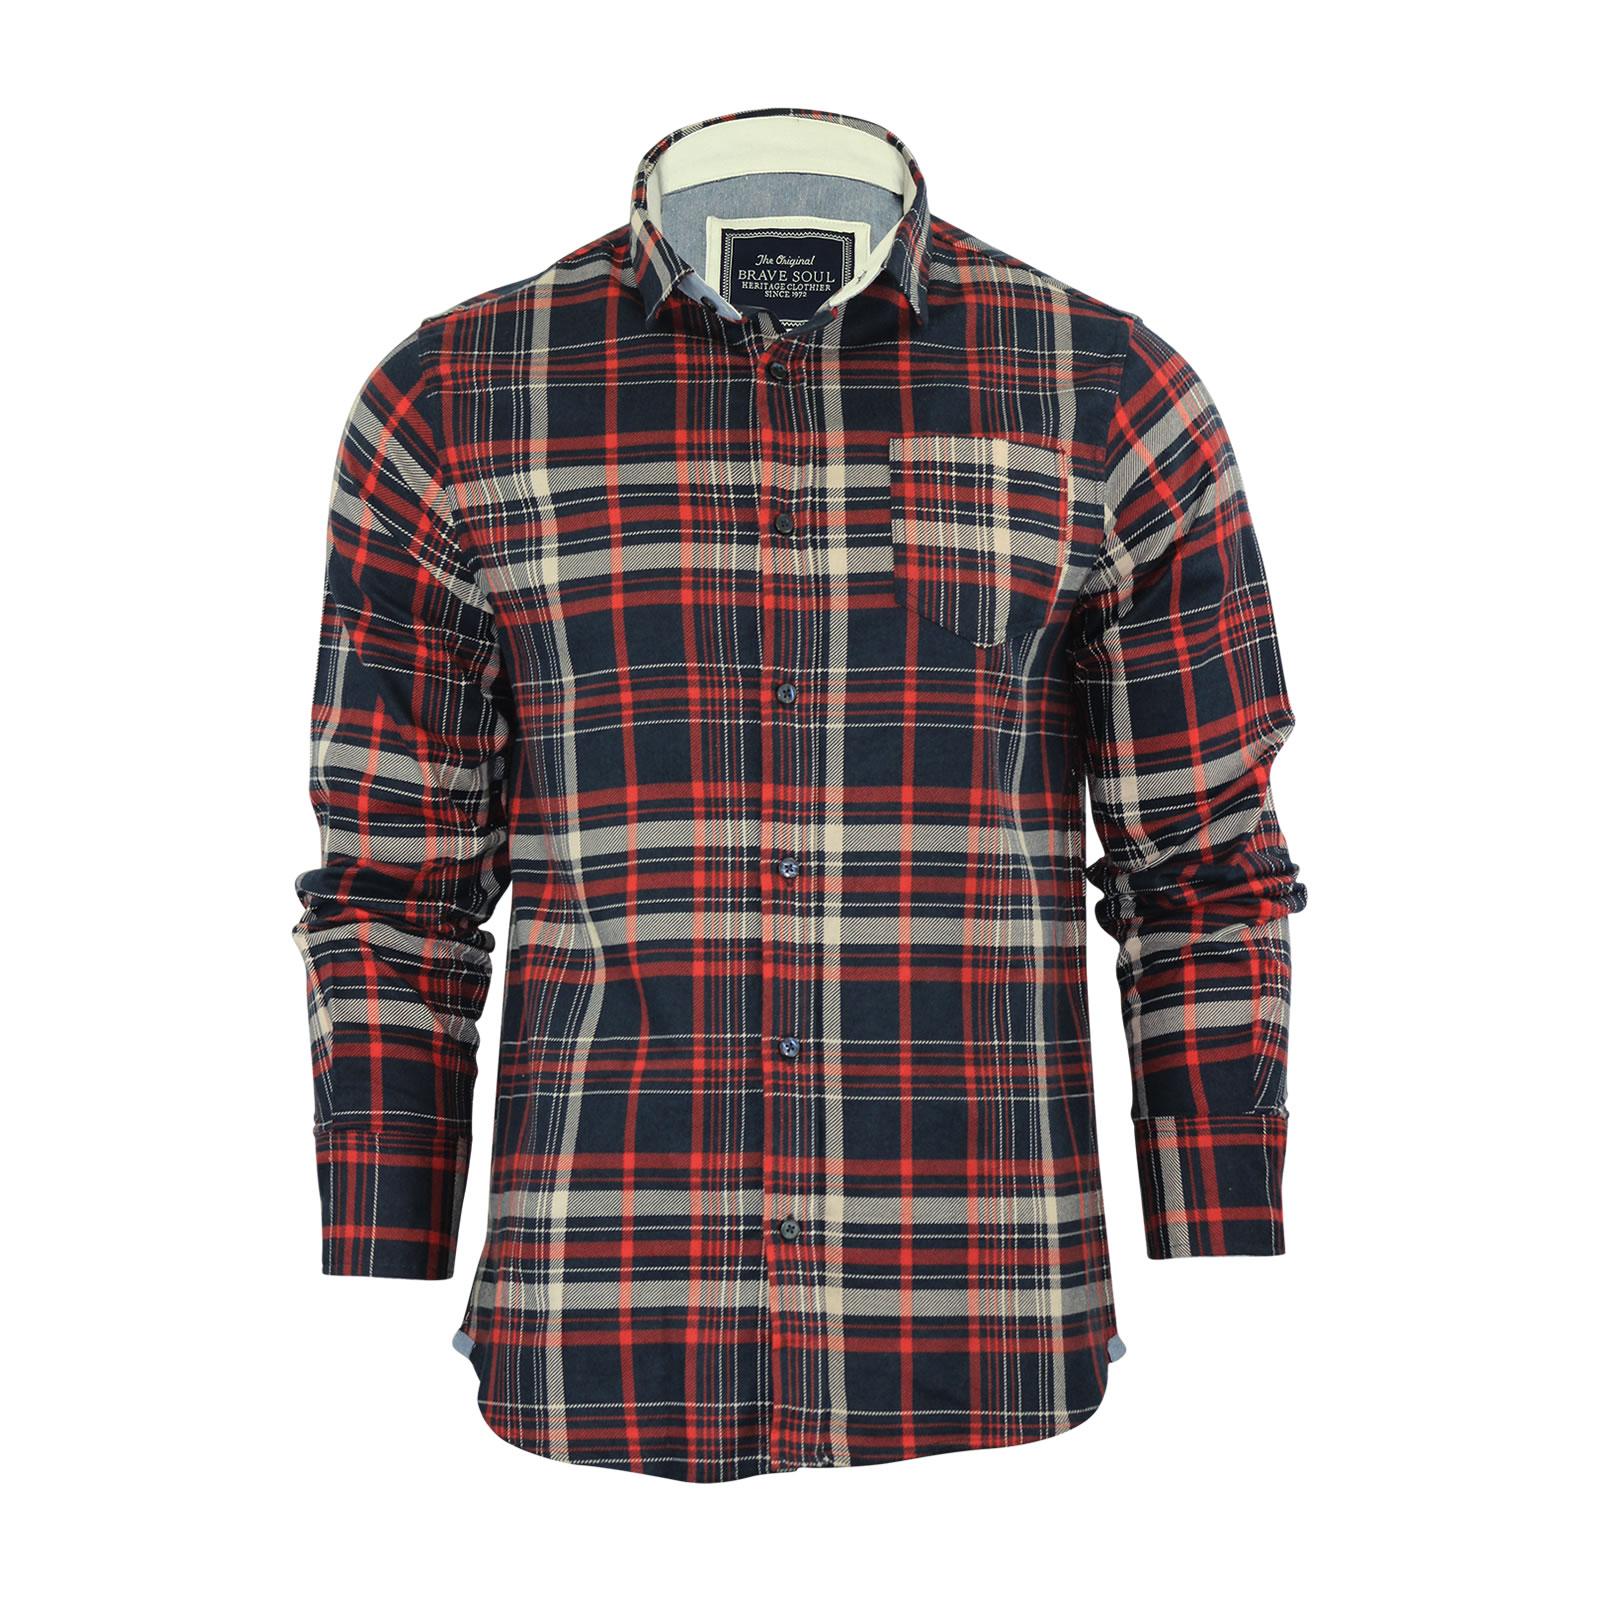 Brave Soul Cotton Shirt £9.99 Delivered @ Ebay Capo_Clothing